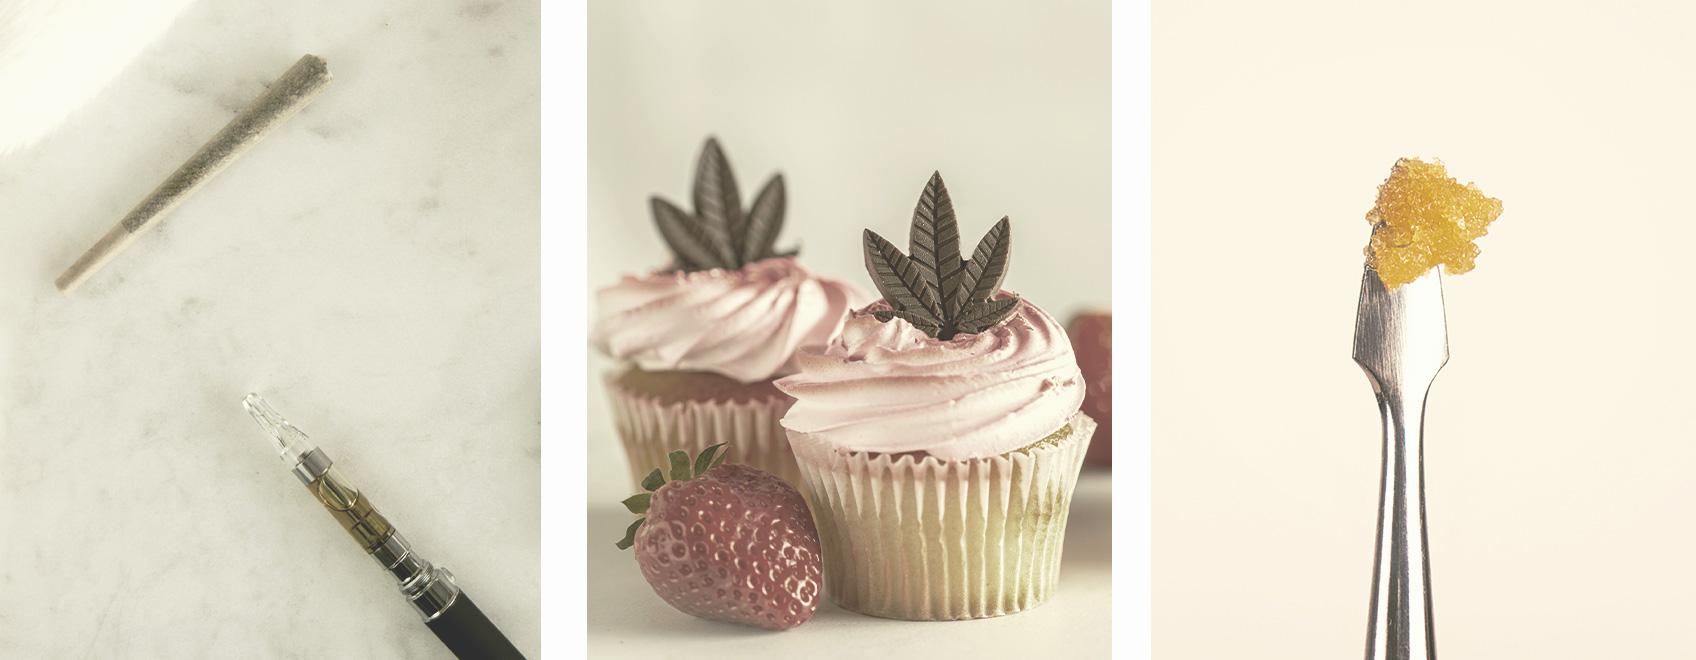 How Long Will My Cannabis High Last?